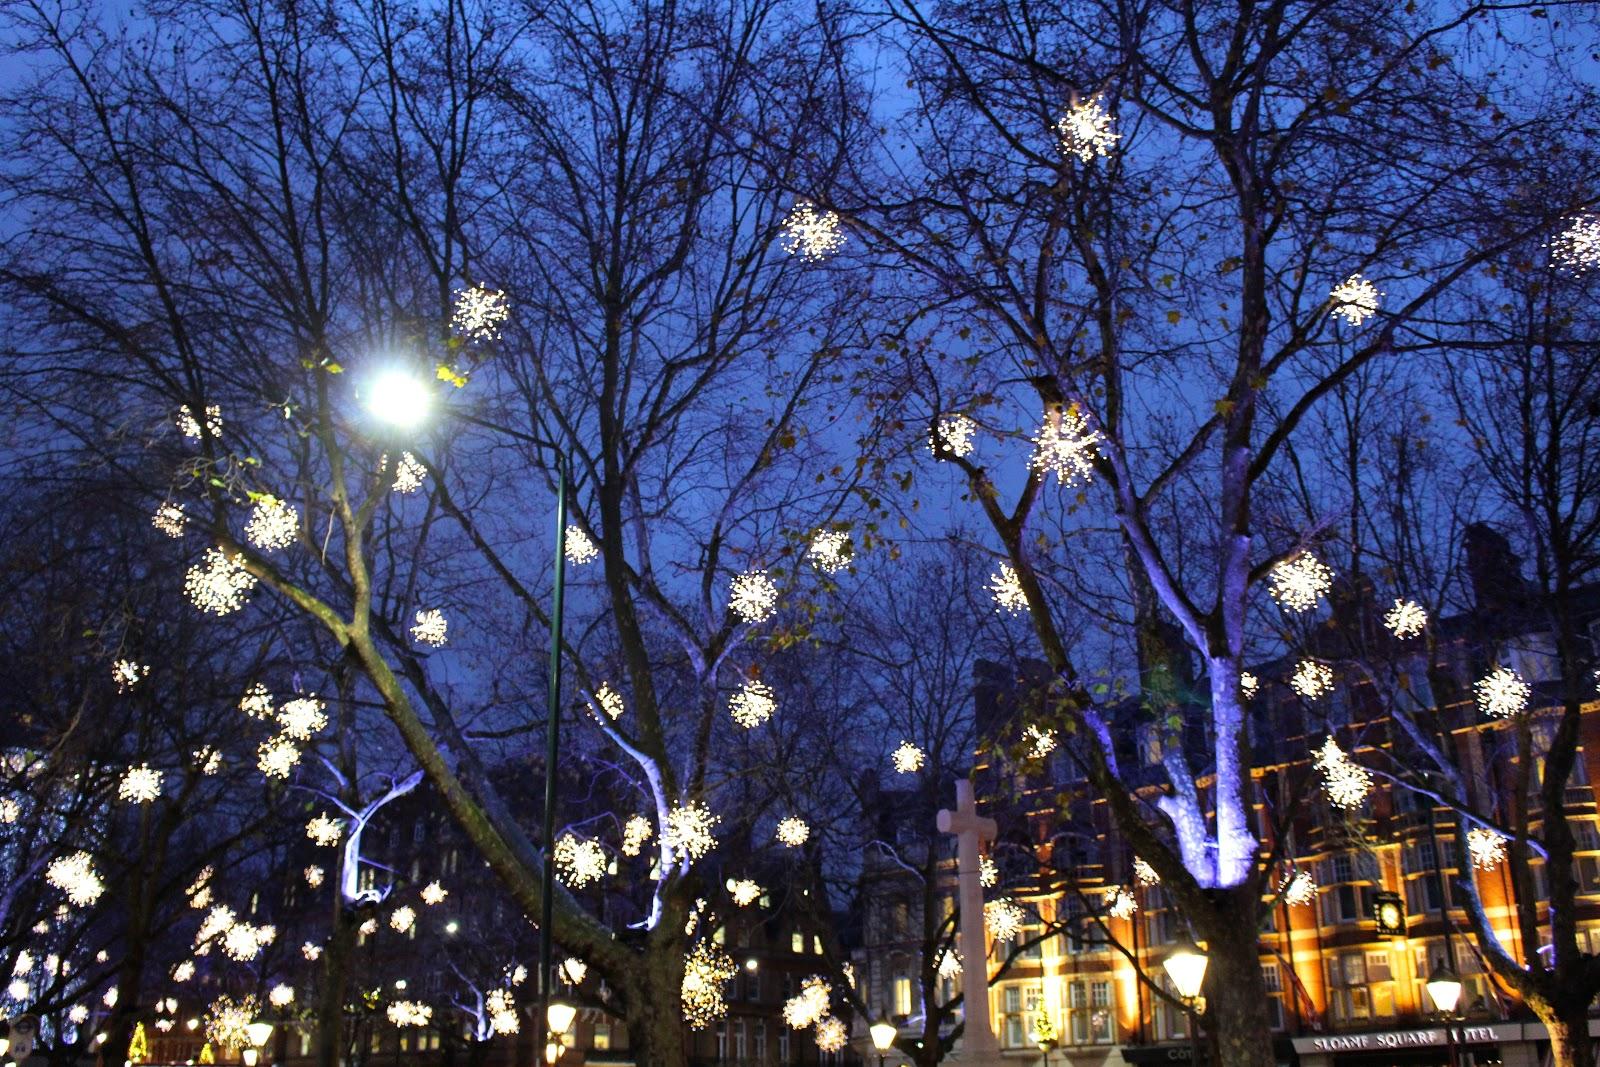 Sloane square christmas